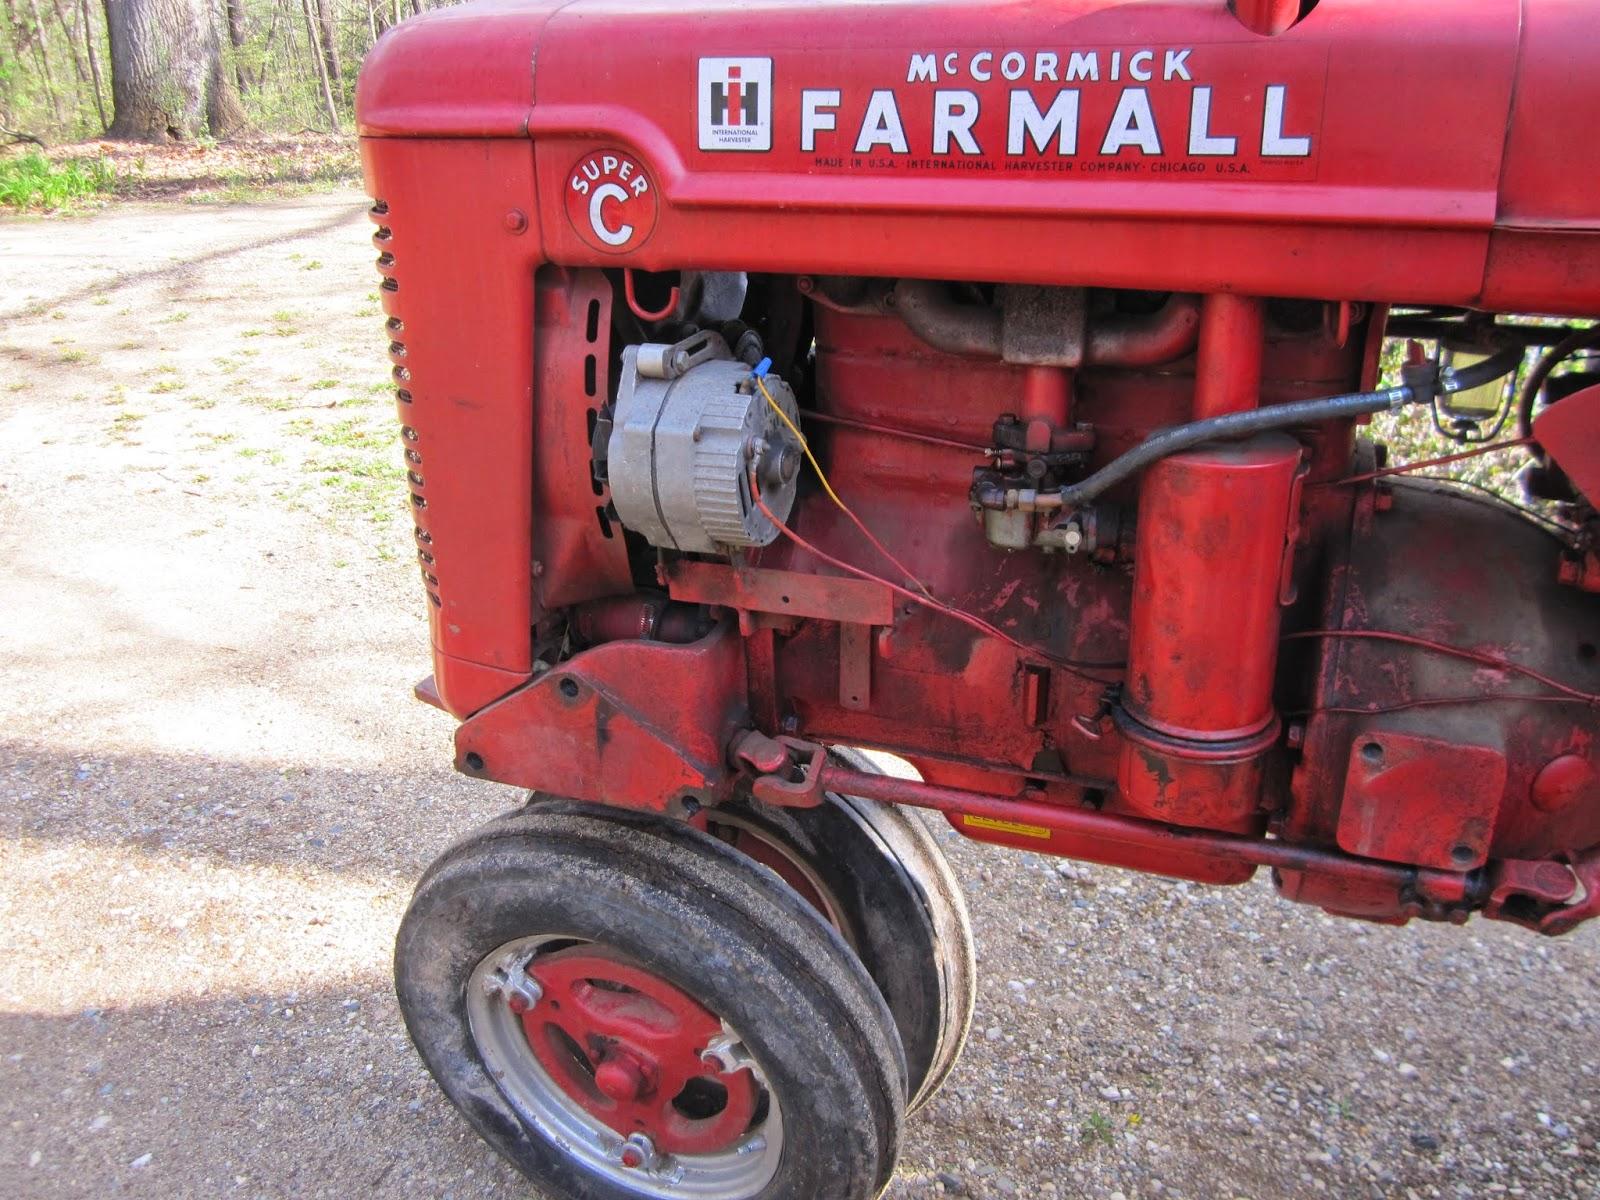 1953 farmall super c serial 184357 farmall super c and fast hitch implements. Black Bedroom Furniture Sets. Home Design Ideas